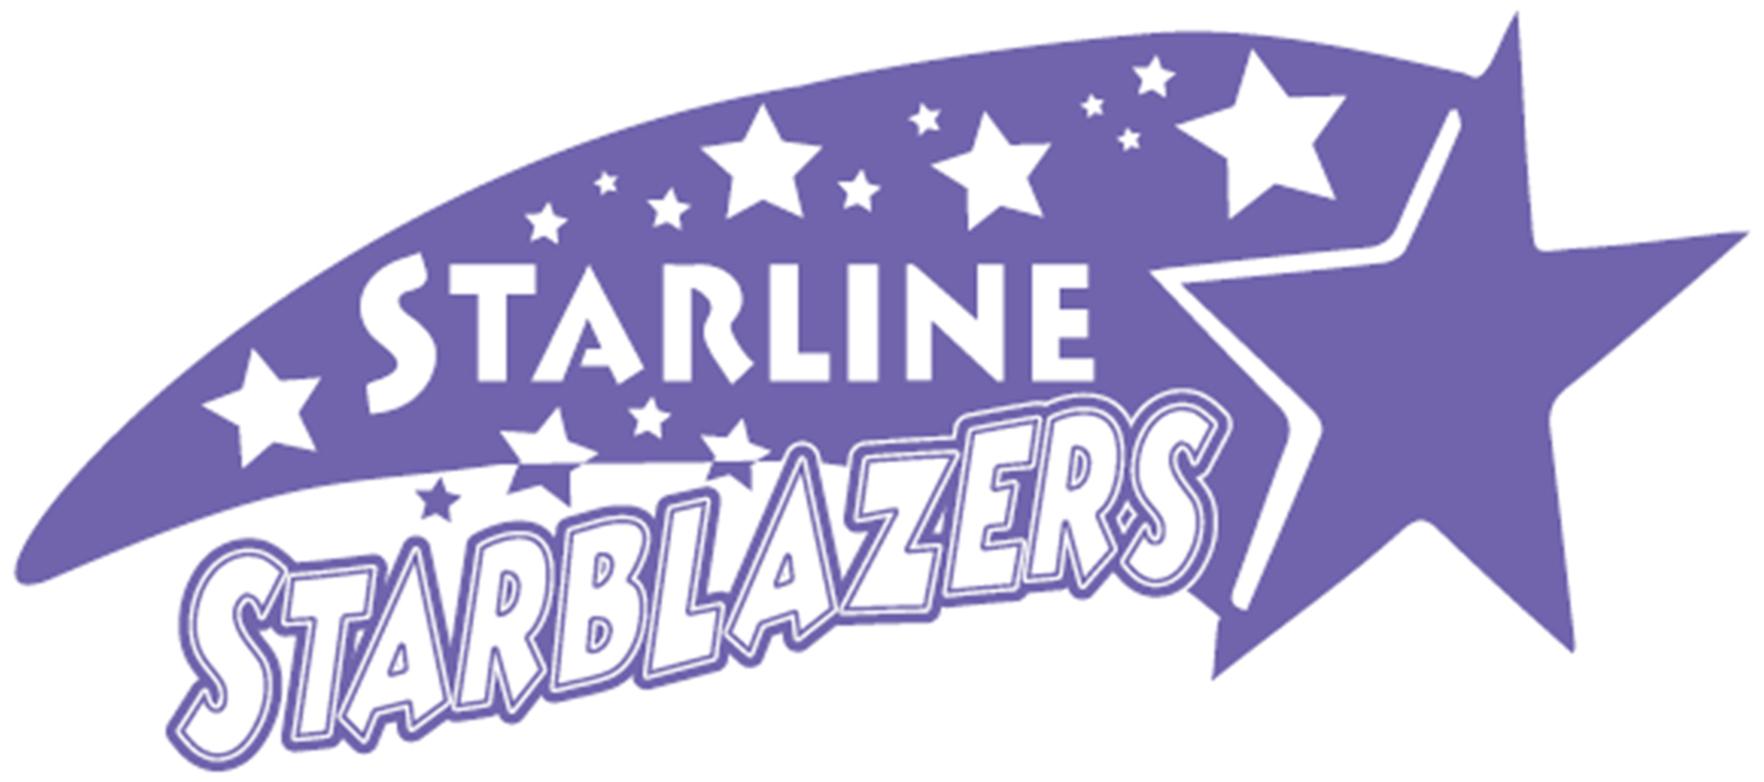 Starline Elementary Starblazers logo